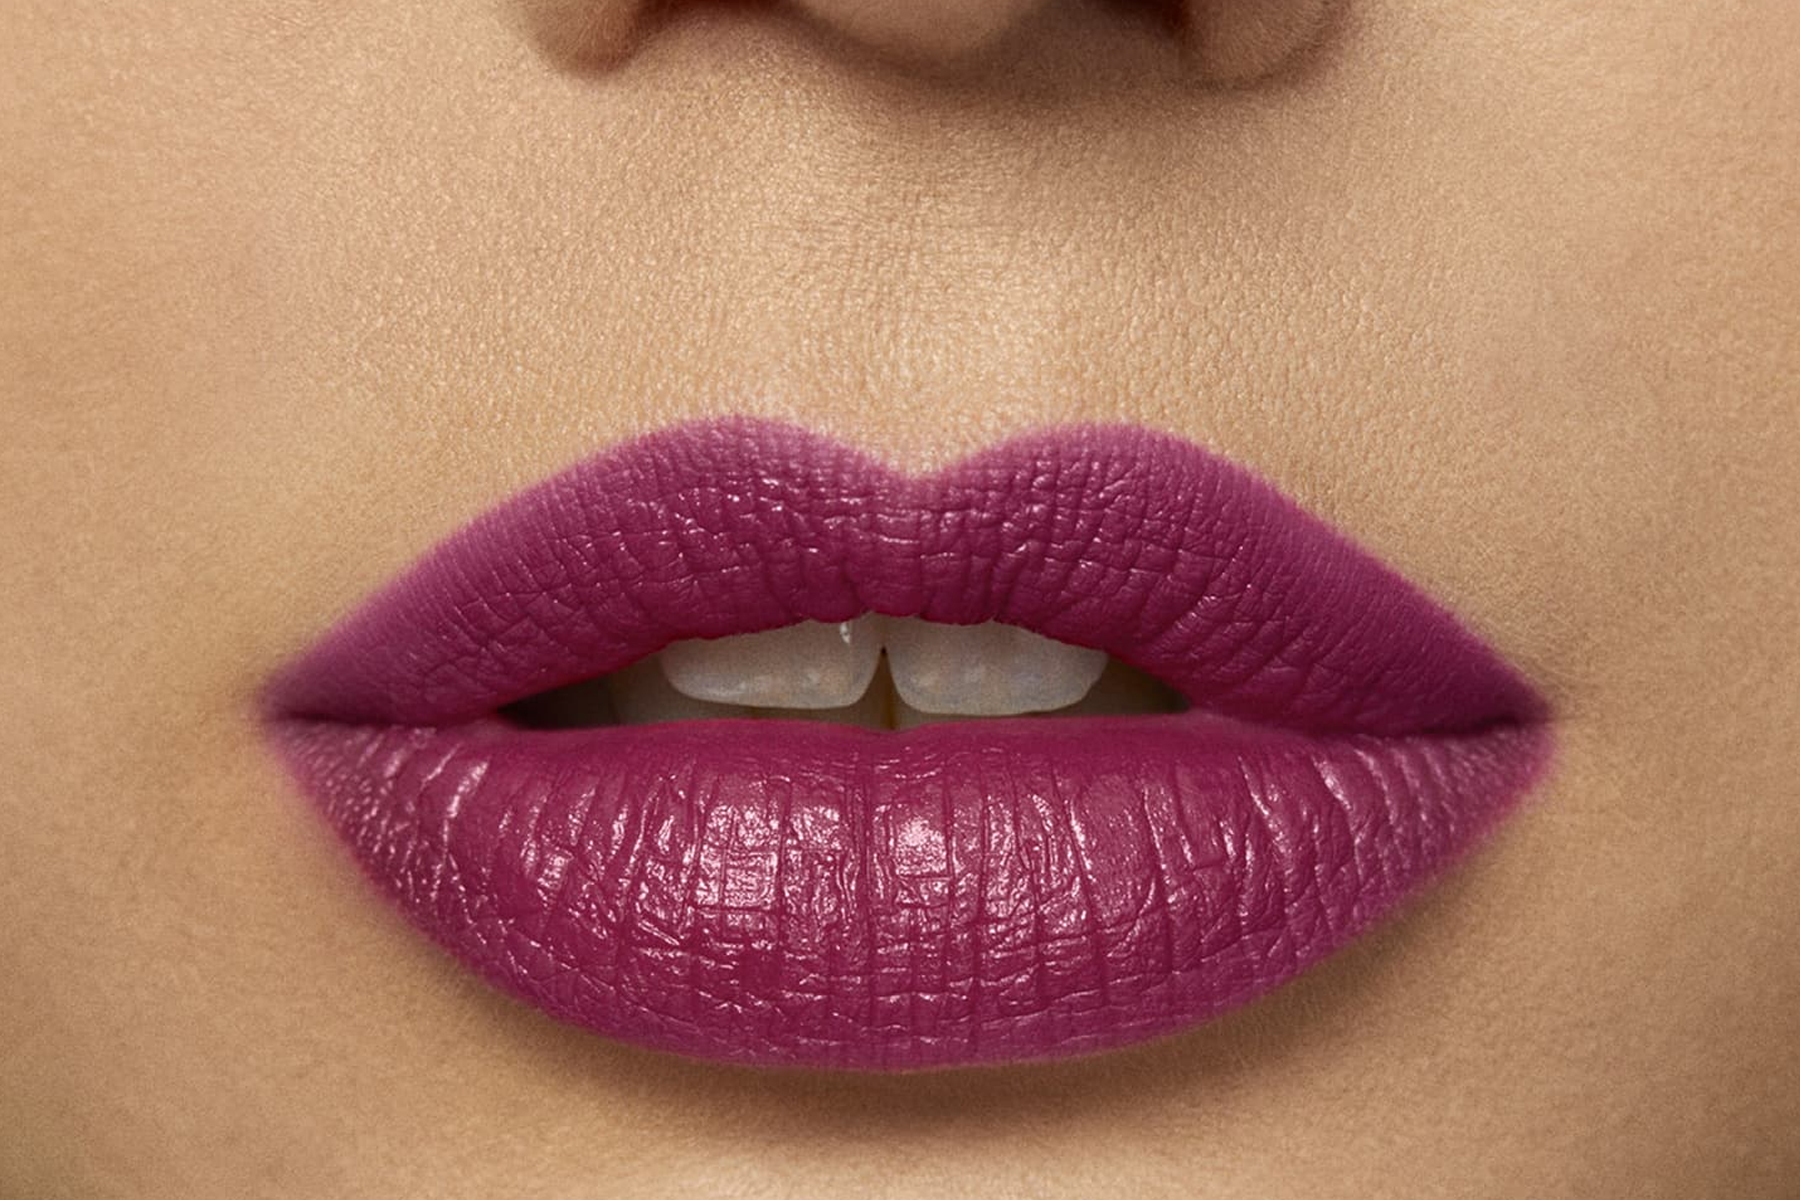 laura-mercier-rouge-essentiel-plum-sublime-swatch